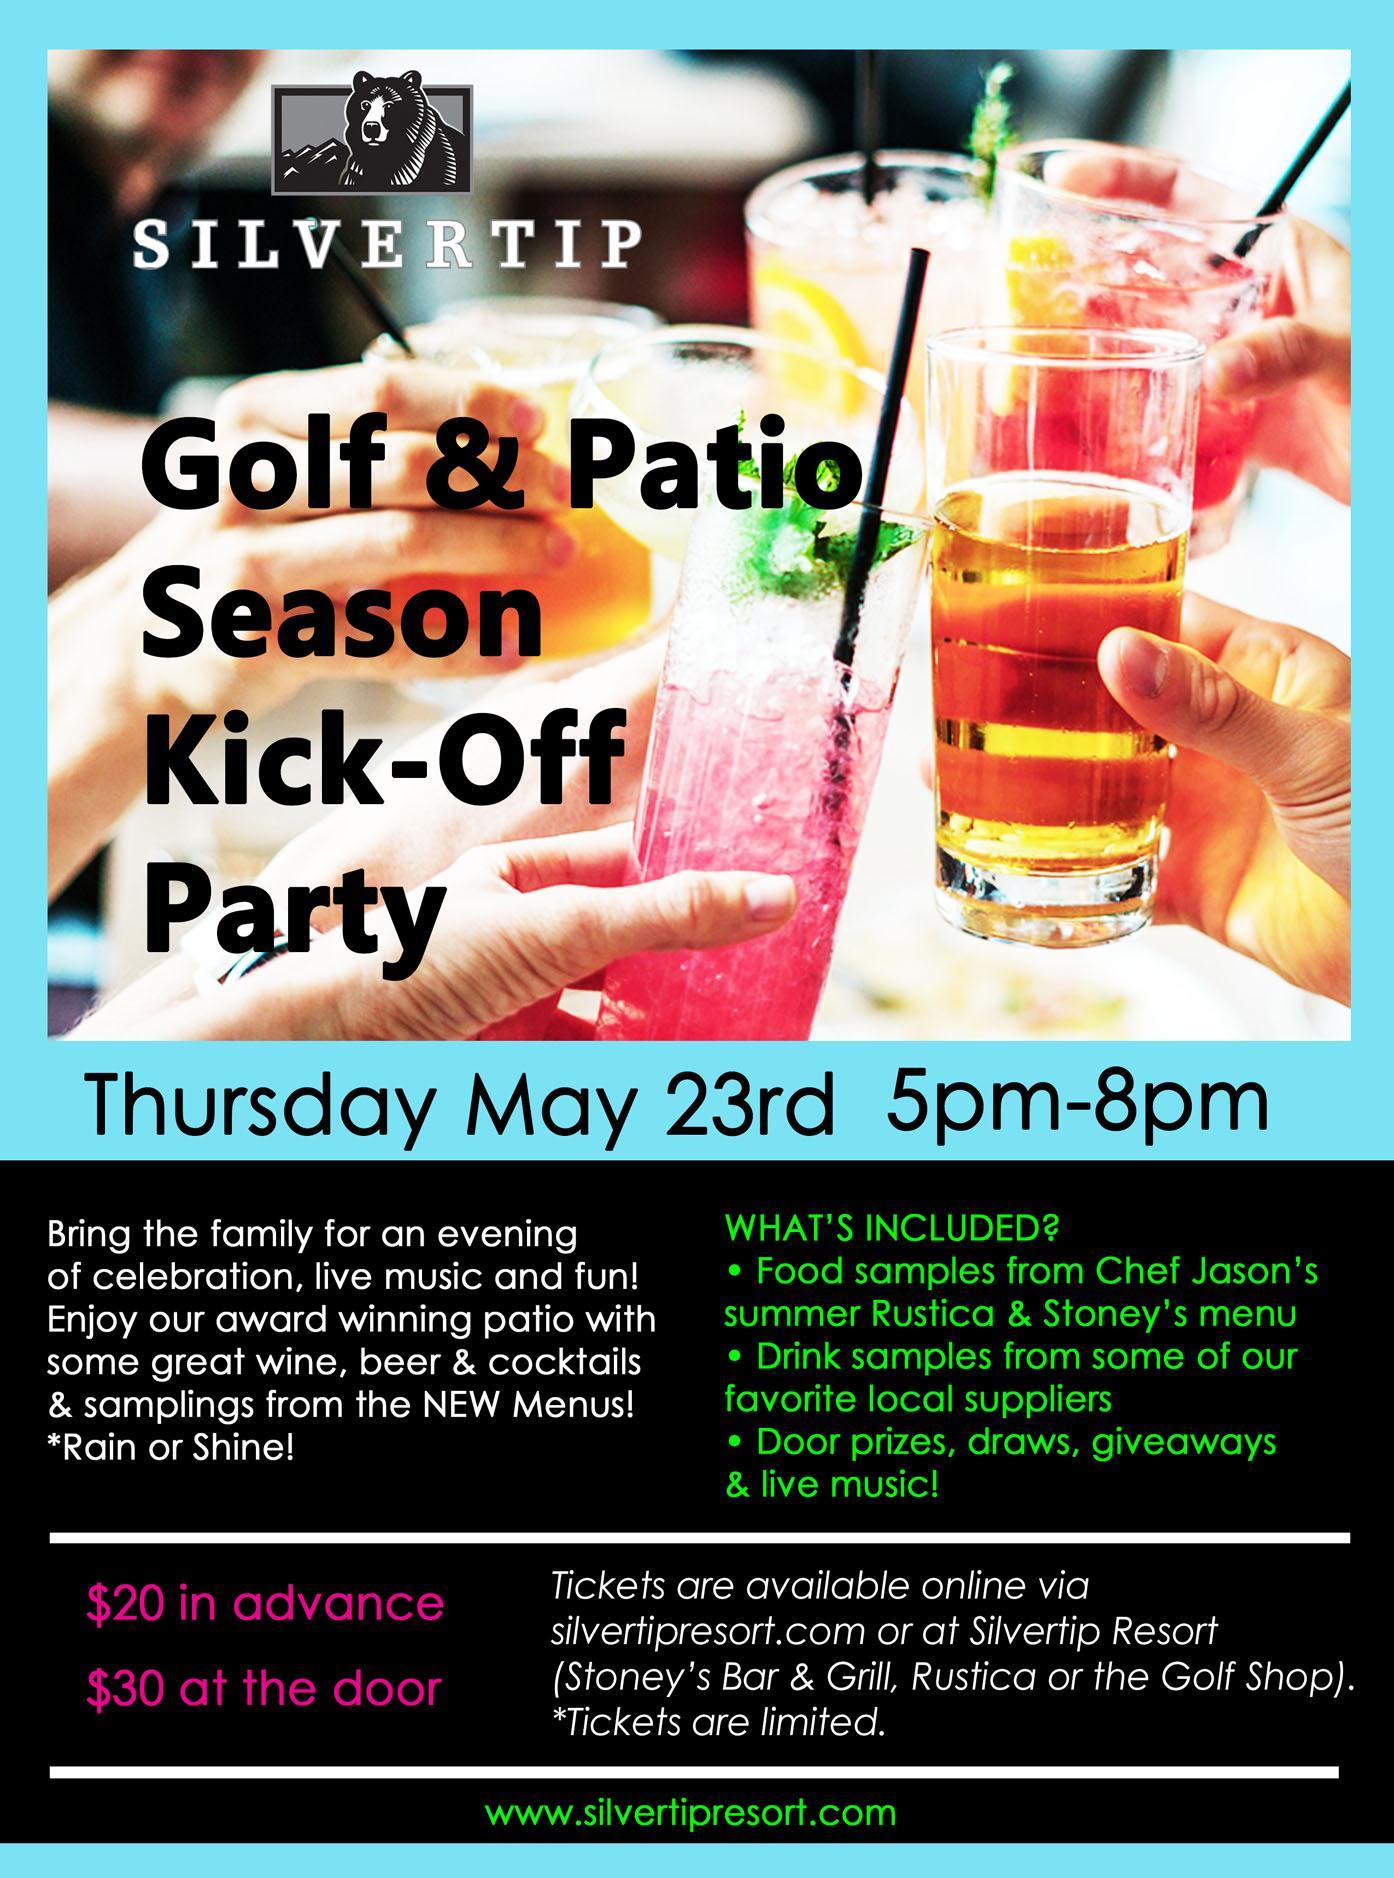 Golf & Patio Season KICK-OFF Party @ Silvertip